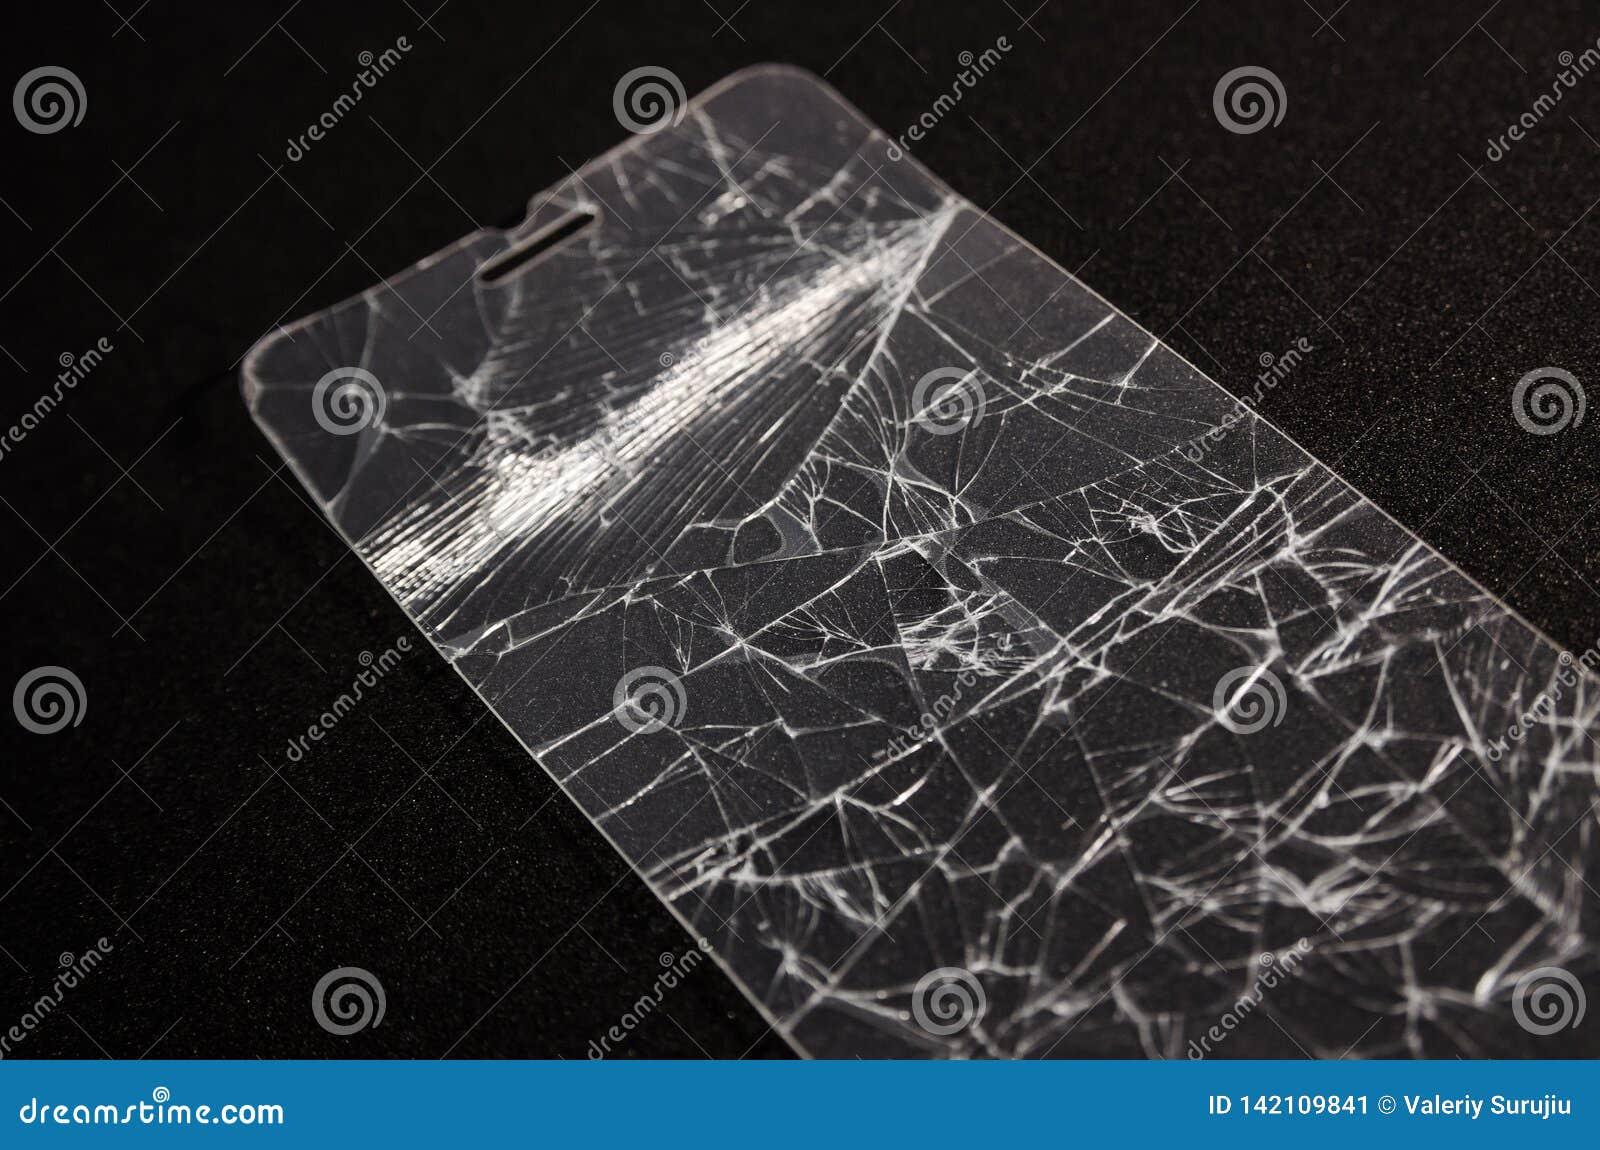 buy online 6f570 b2d0c Broken screen of a phone stock image. Image of background - 142109841